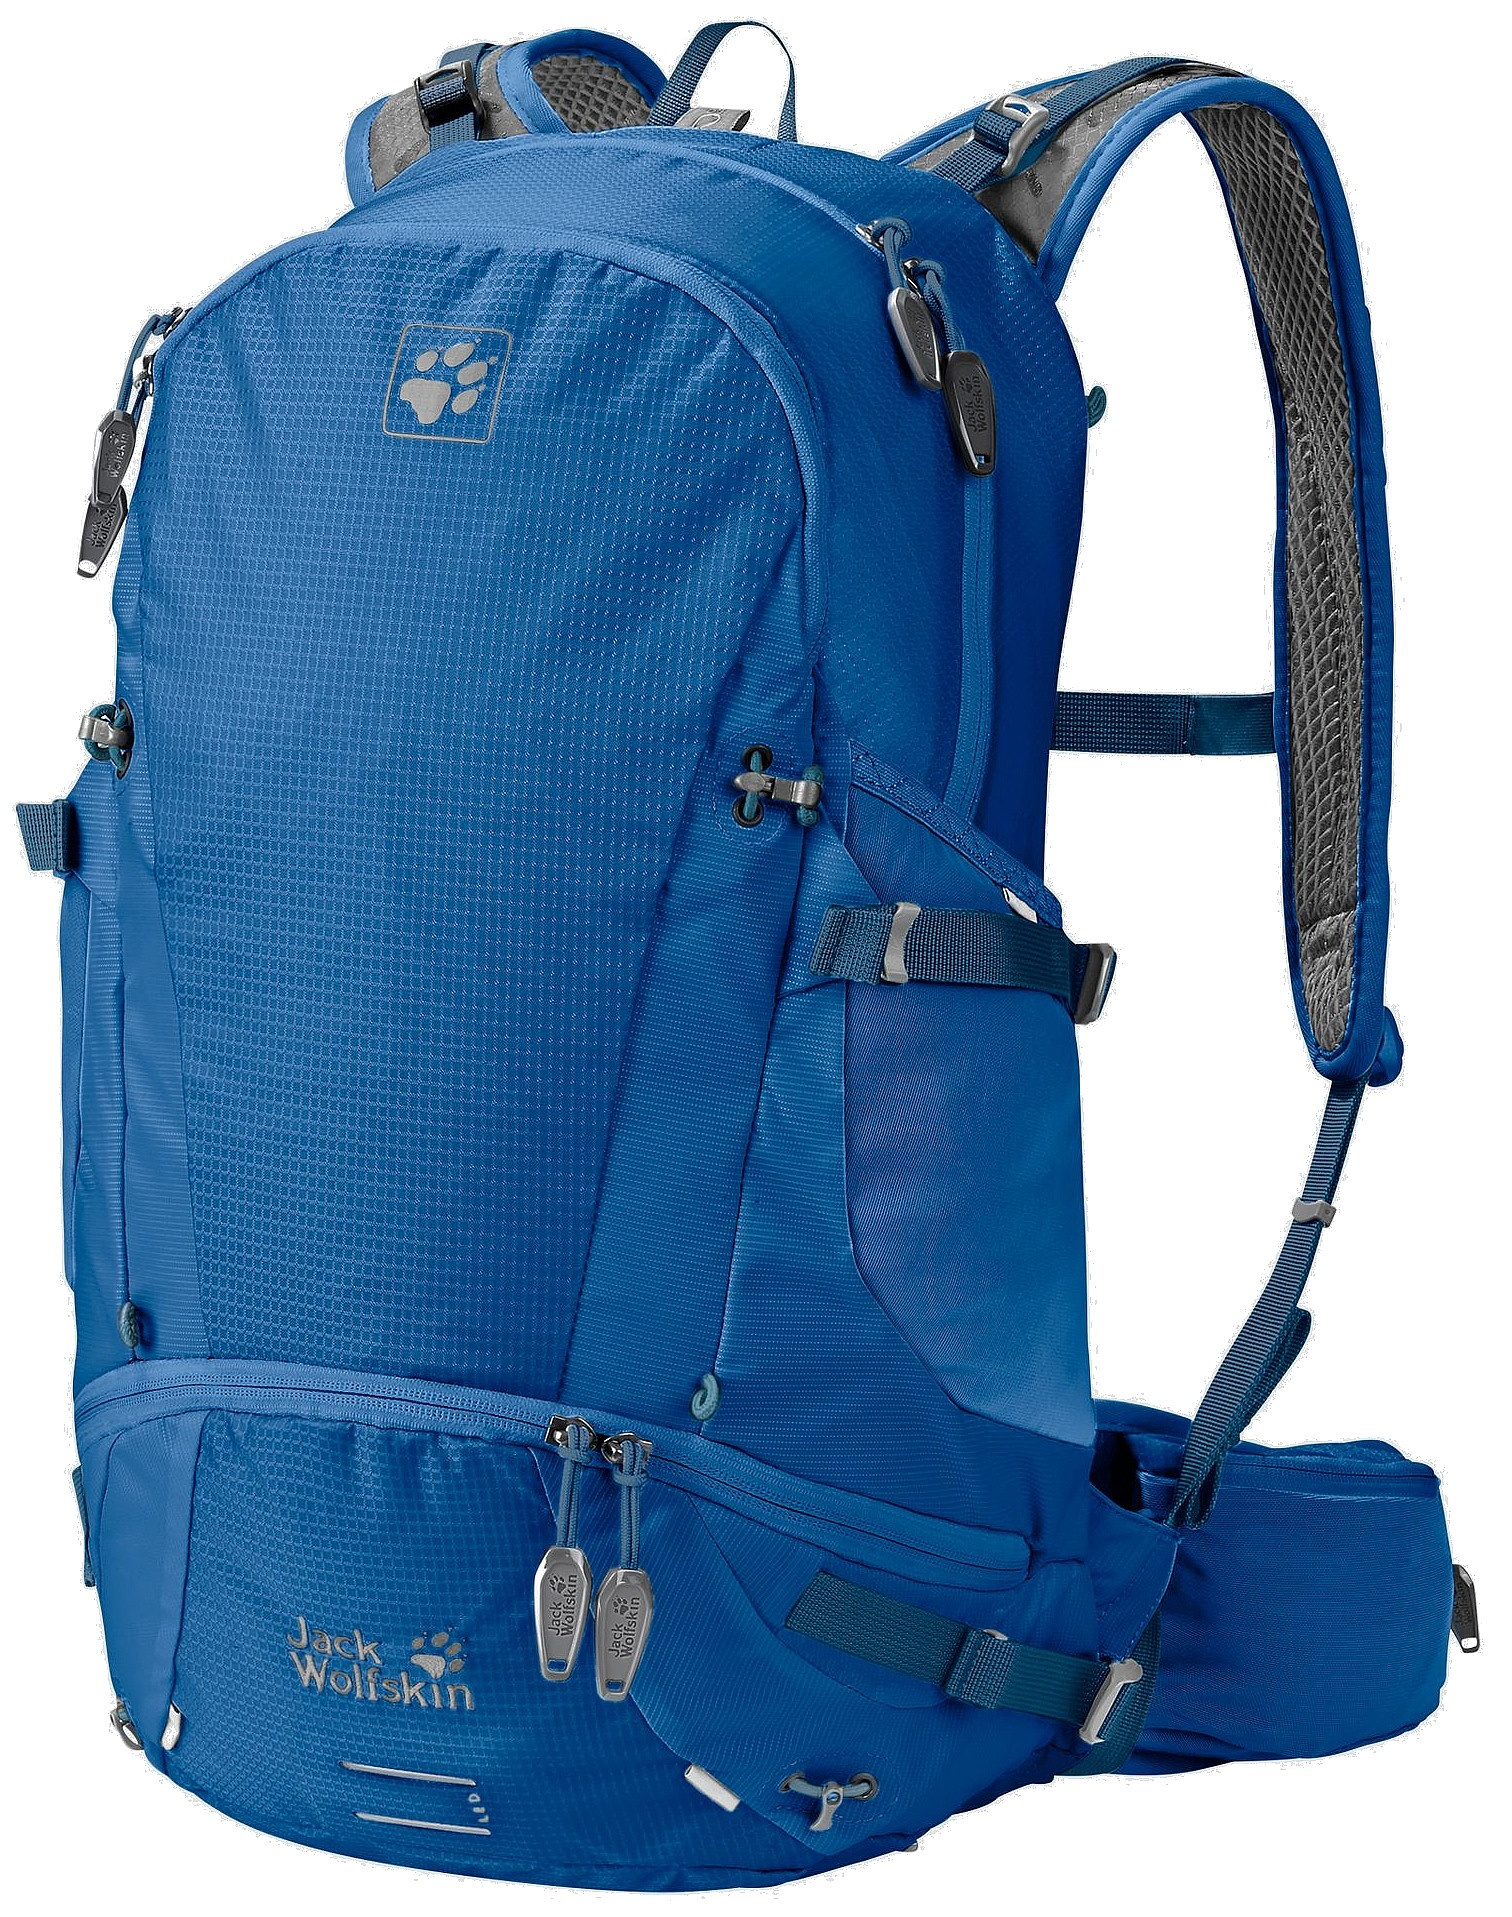 22503fb474014 batoh Jack Wolfskin Moab Jam 30 - Electric Blue 30 L